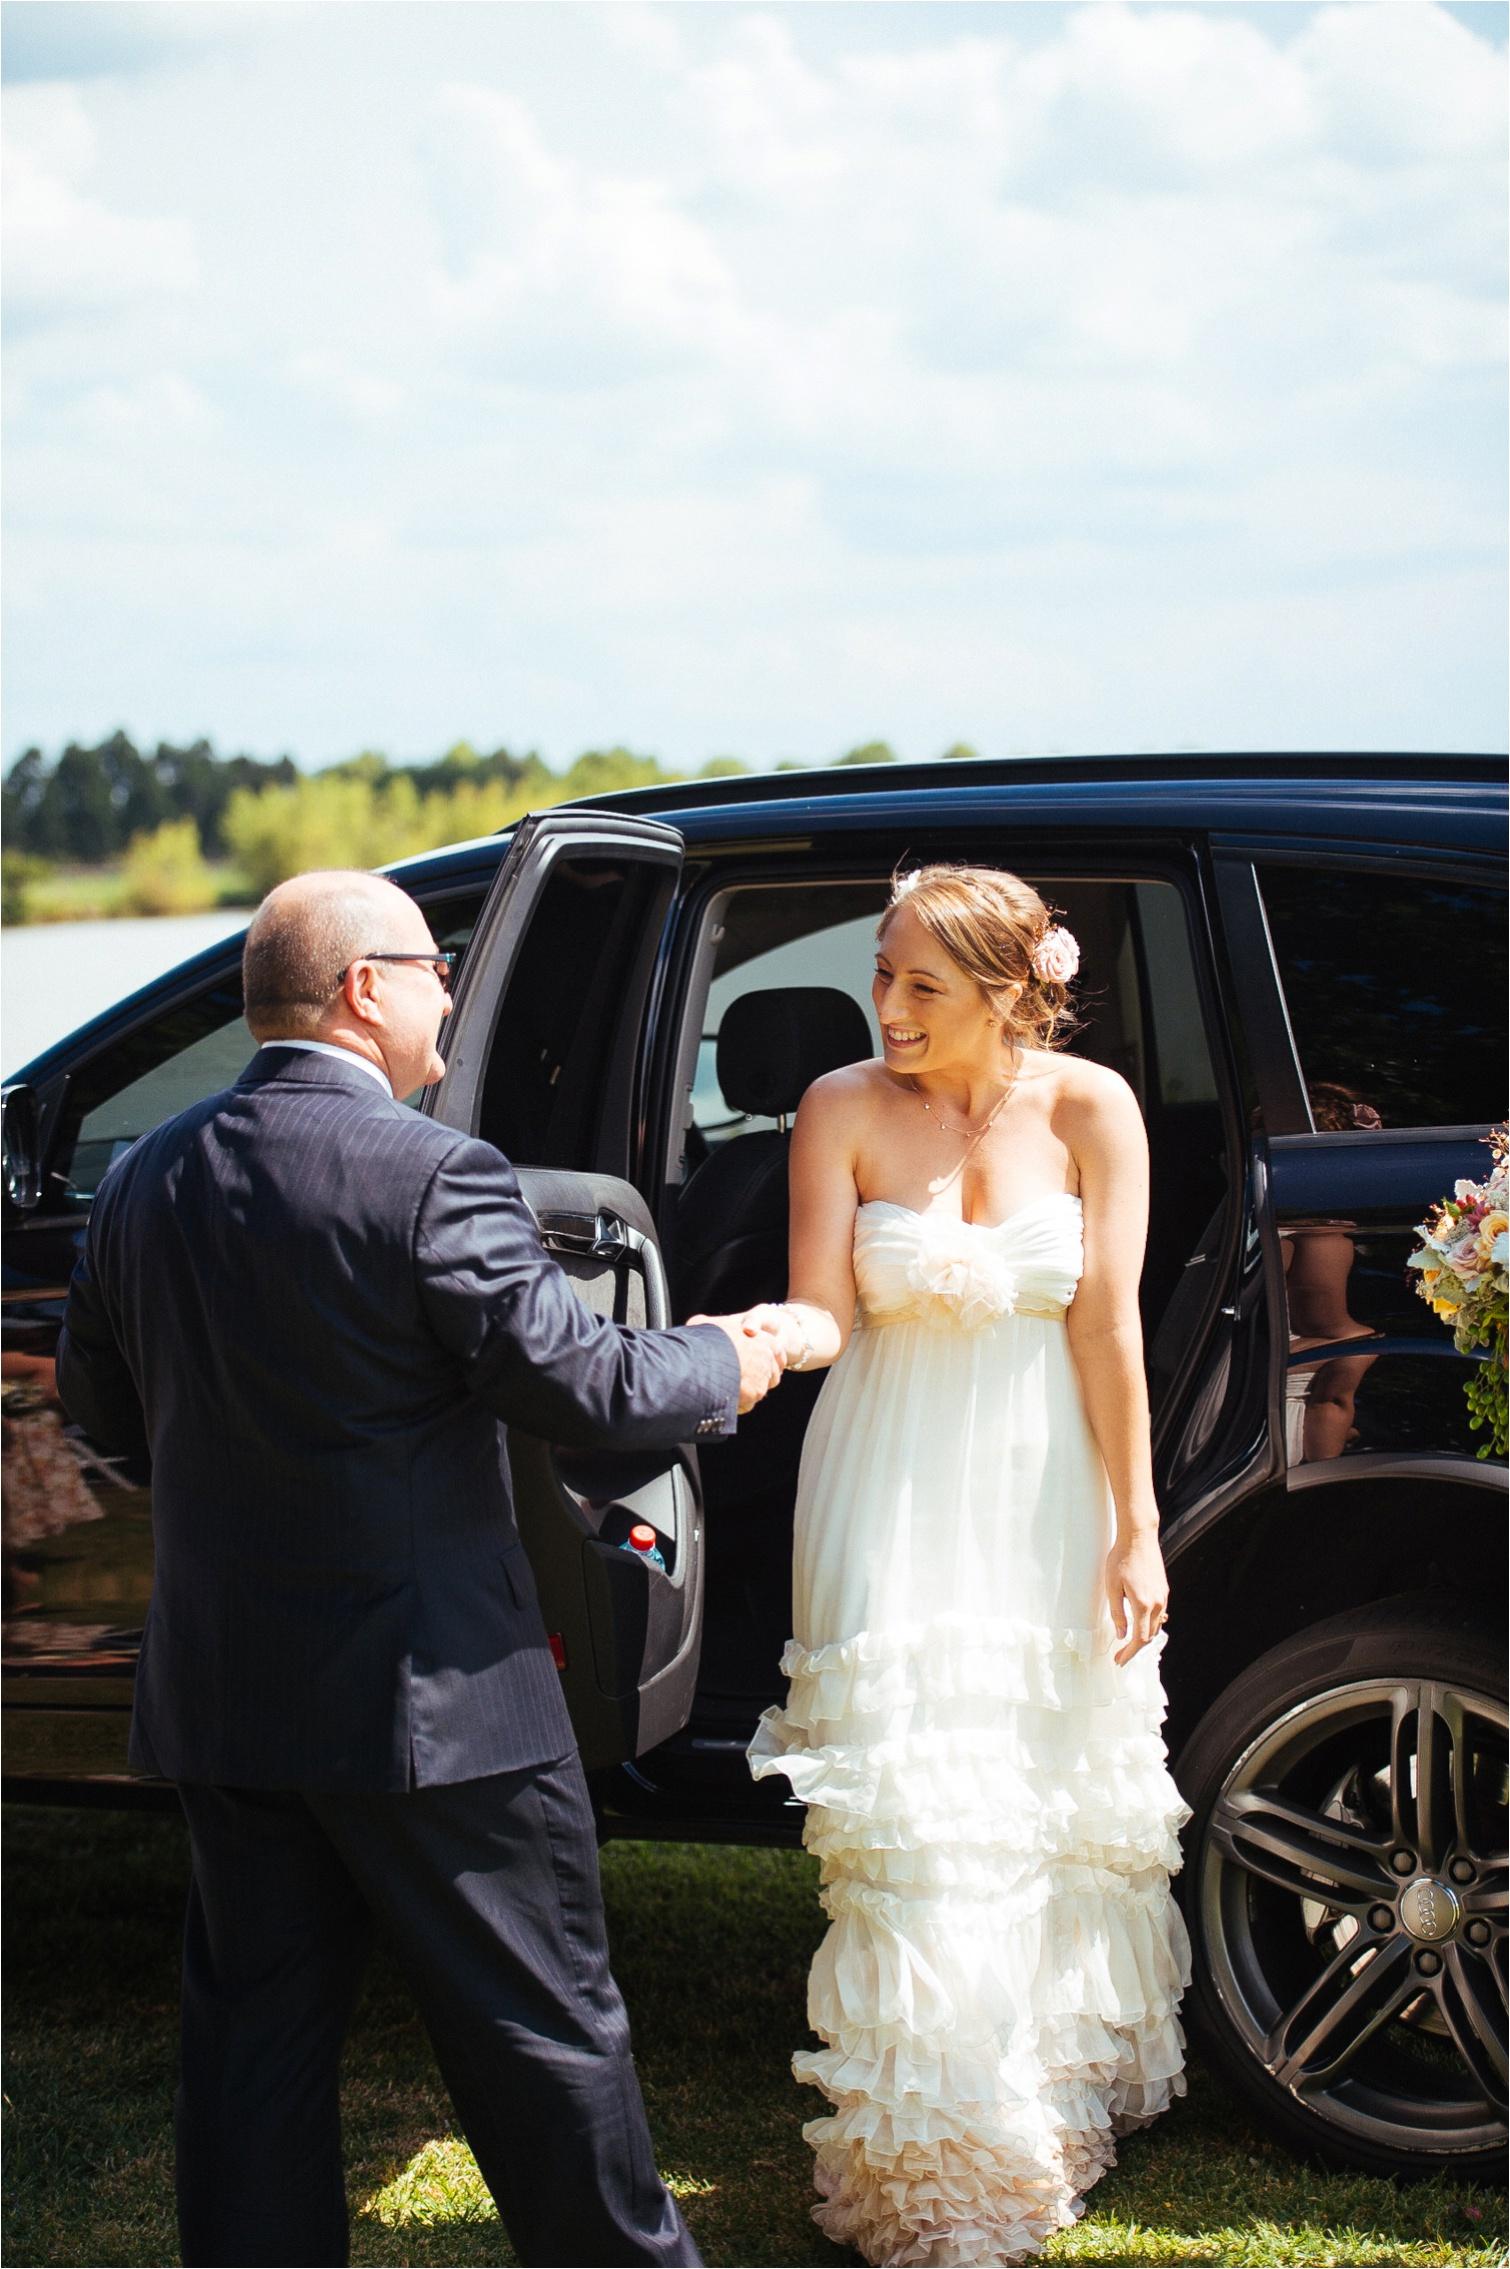 Jenny&Mitch_Sebel_Windsor_Sydney_Polo_Club_wedding-by_The_Follans_Gold_Coast_Wedding_Photographers_0045.jpg